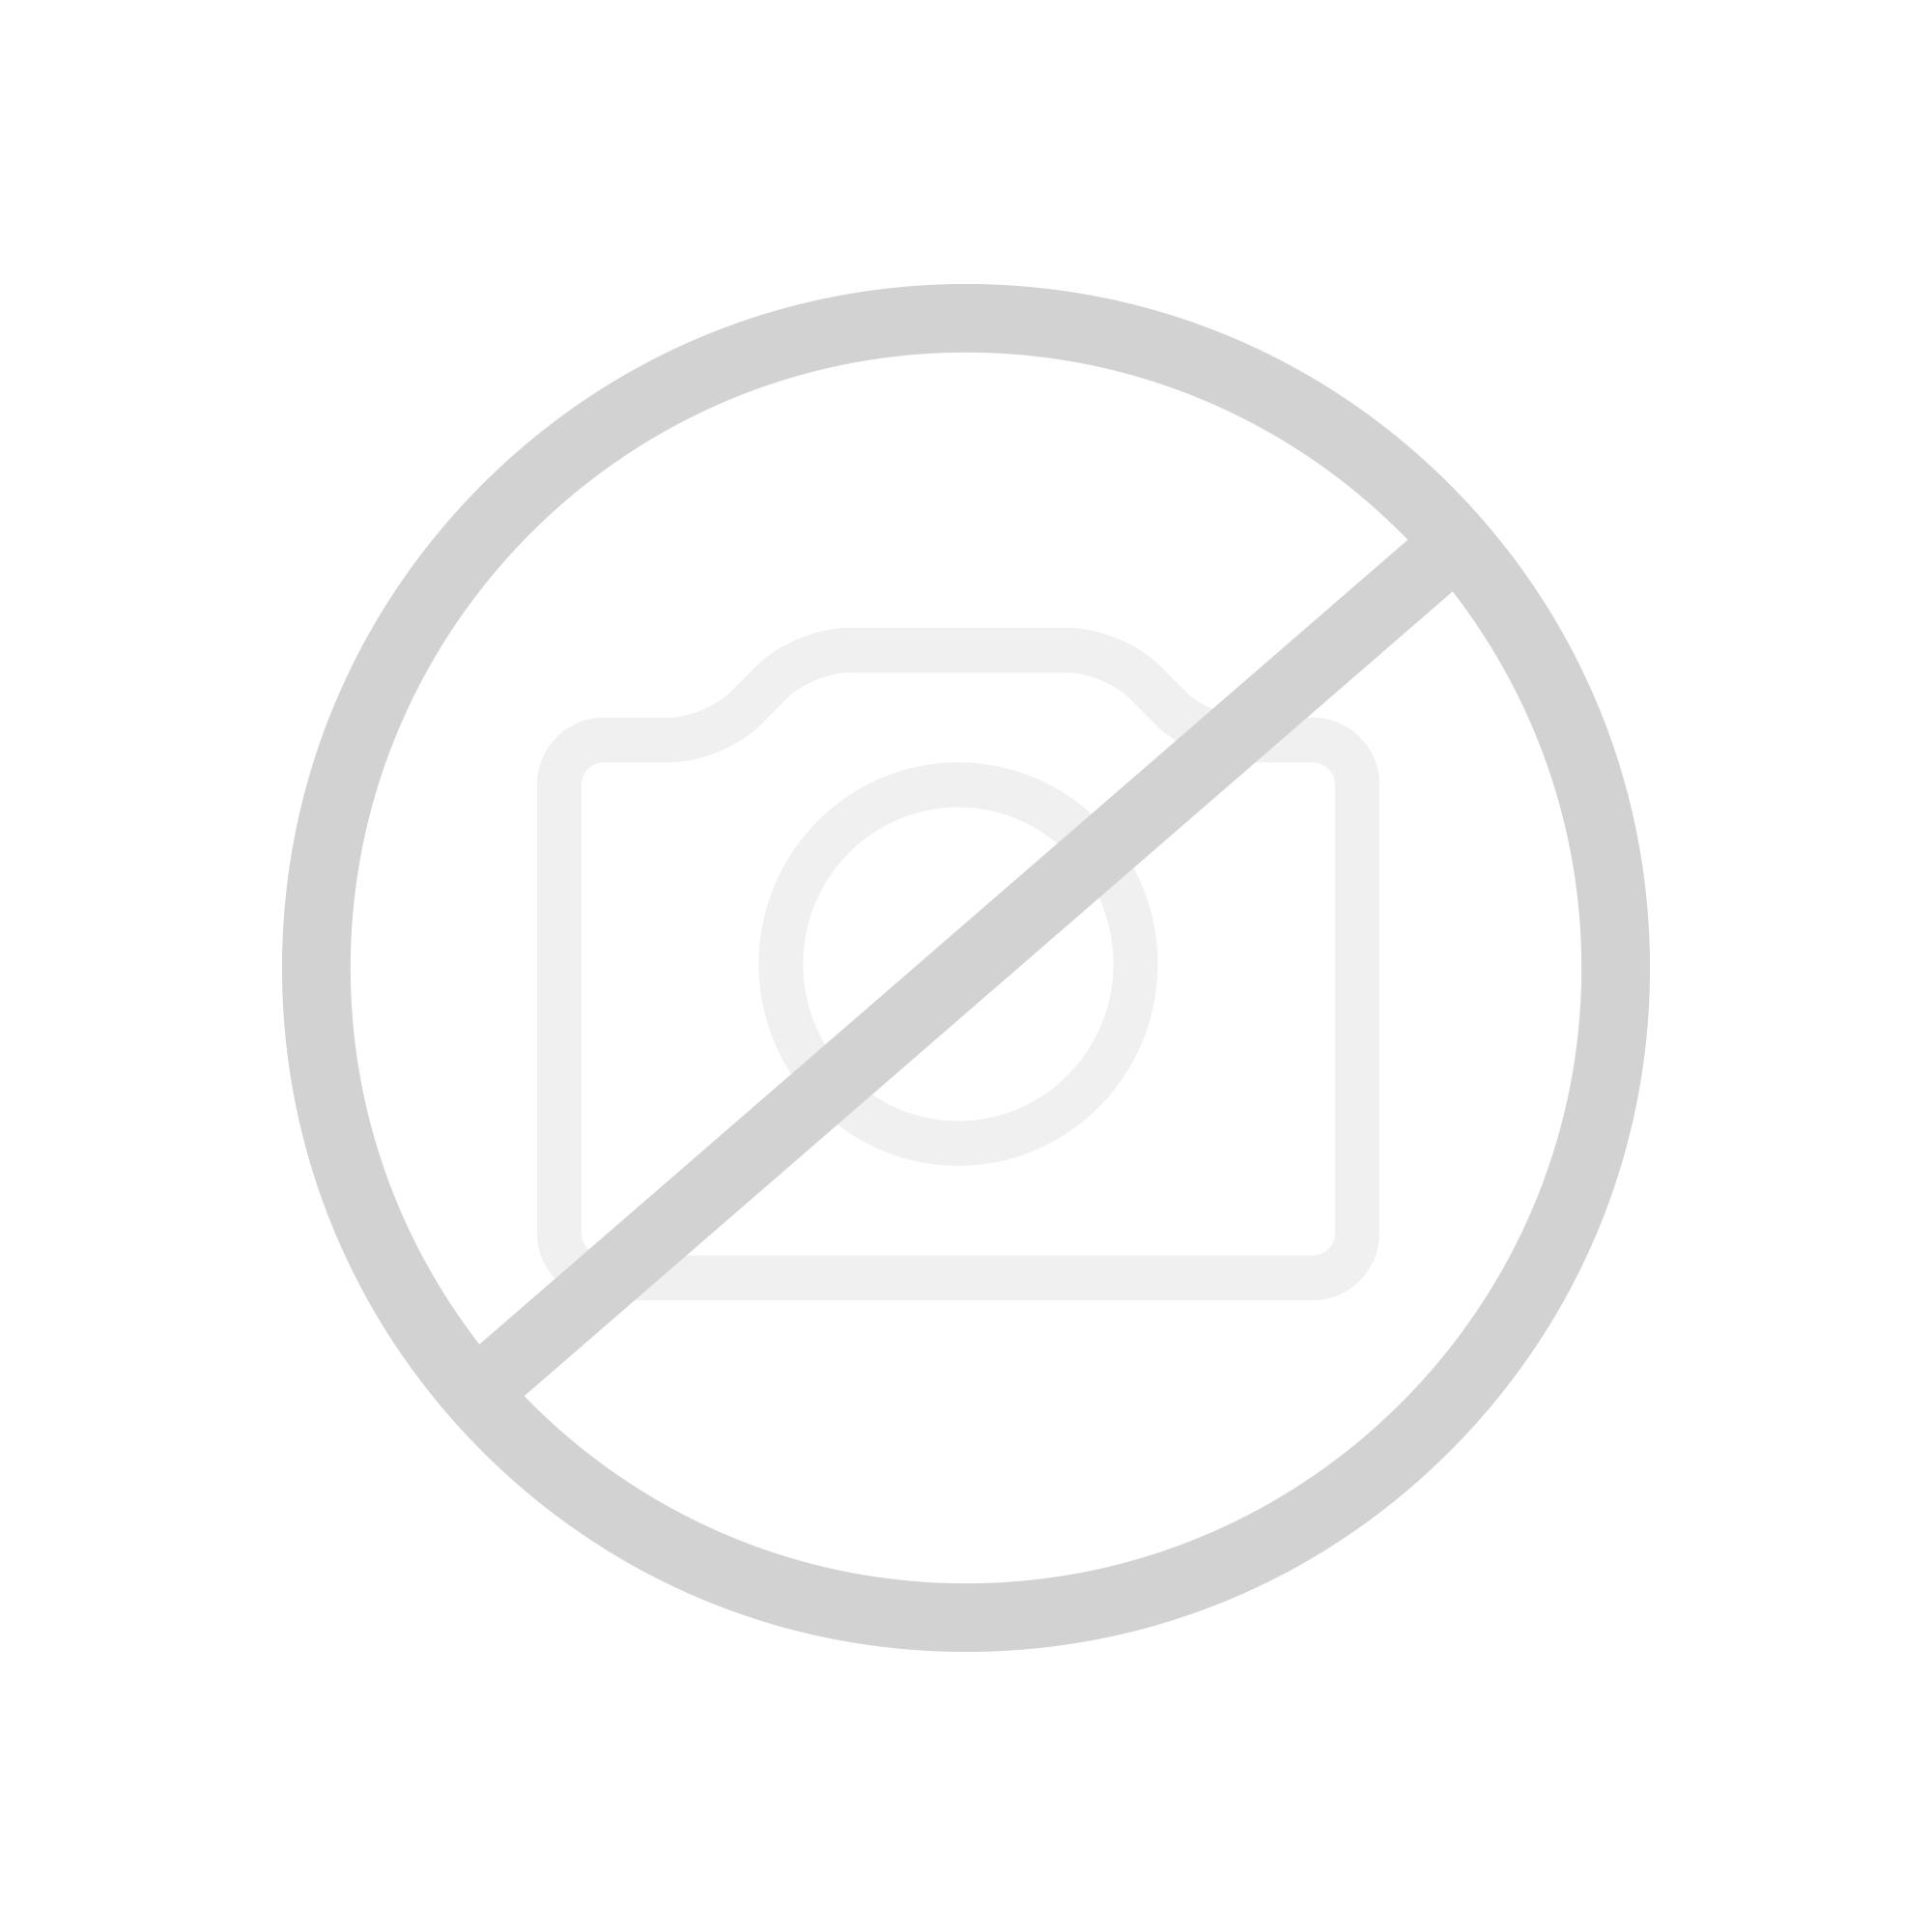 vasco alu zen vertikal heizk rper wei breite 450 mm 1742 watt 111140450200000660600 0000. Black Bedroom Furniture Sets. Home Design Ideas